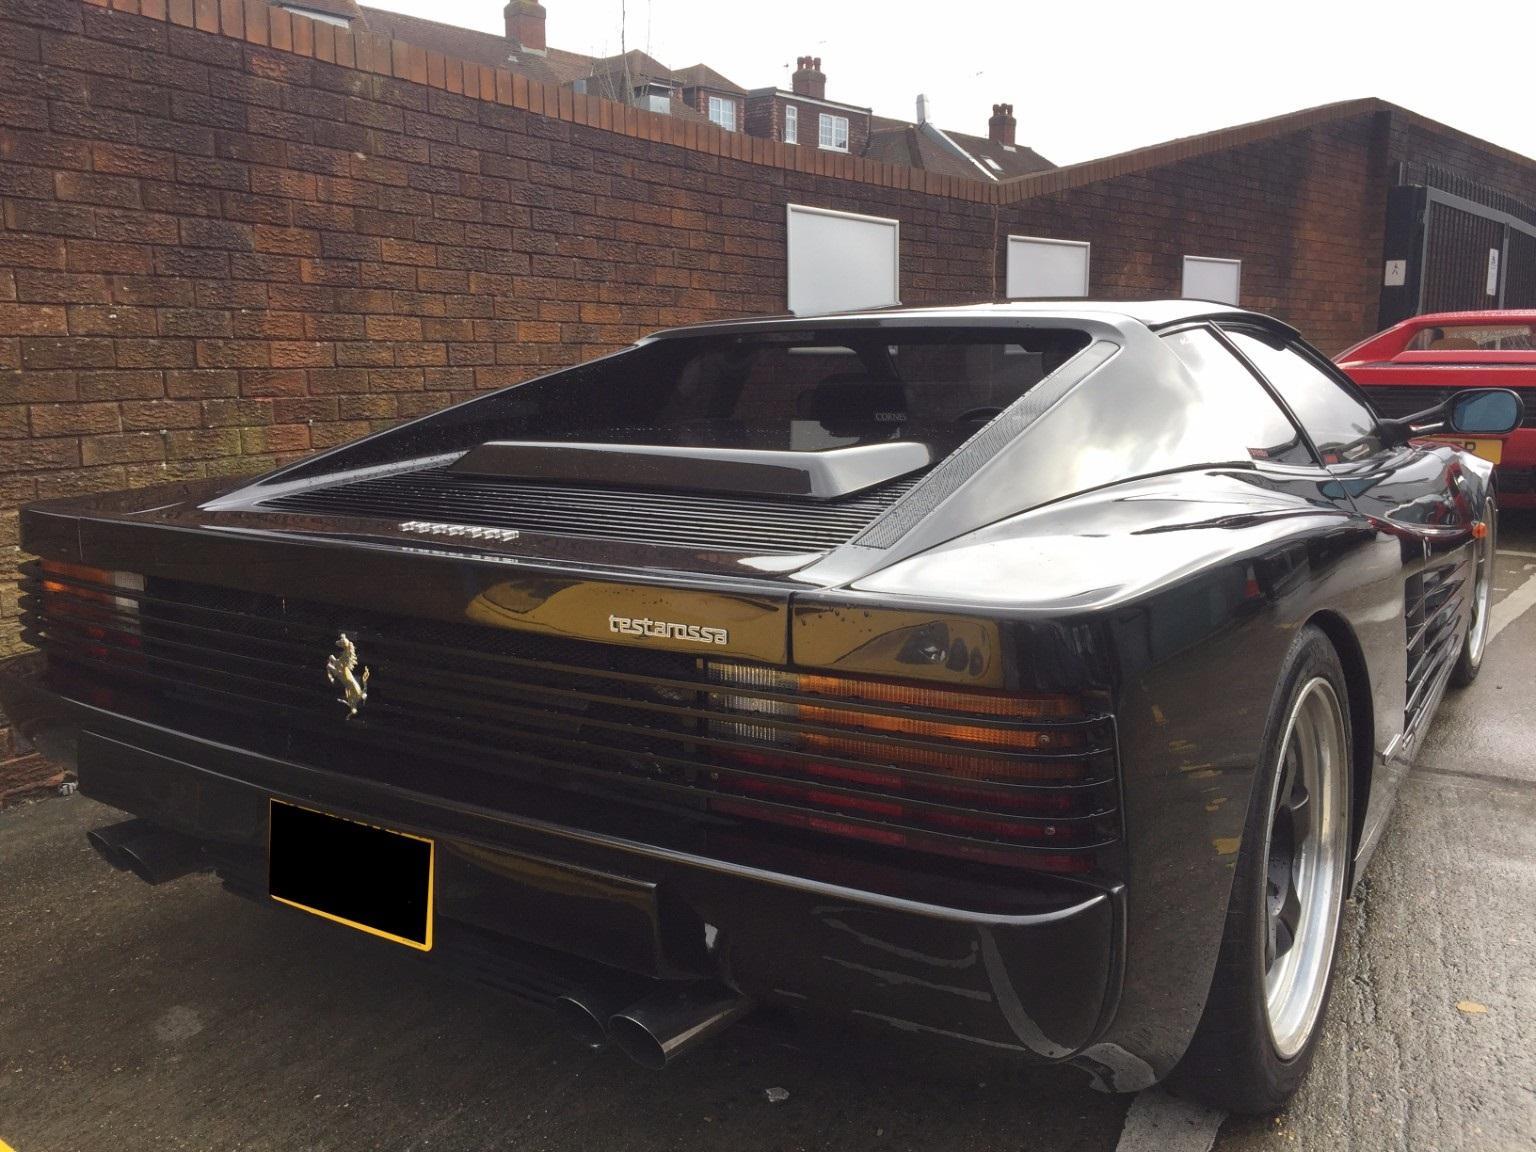 Used Ferrari Testarossa for sale in Epsom, Surrey